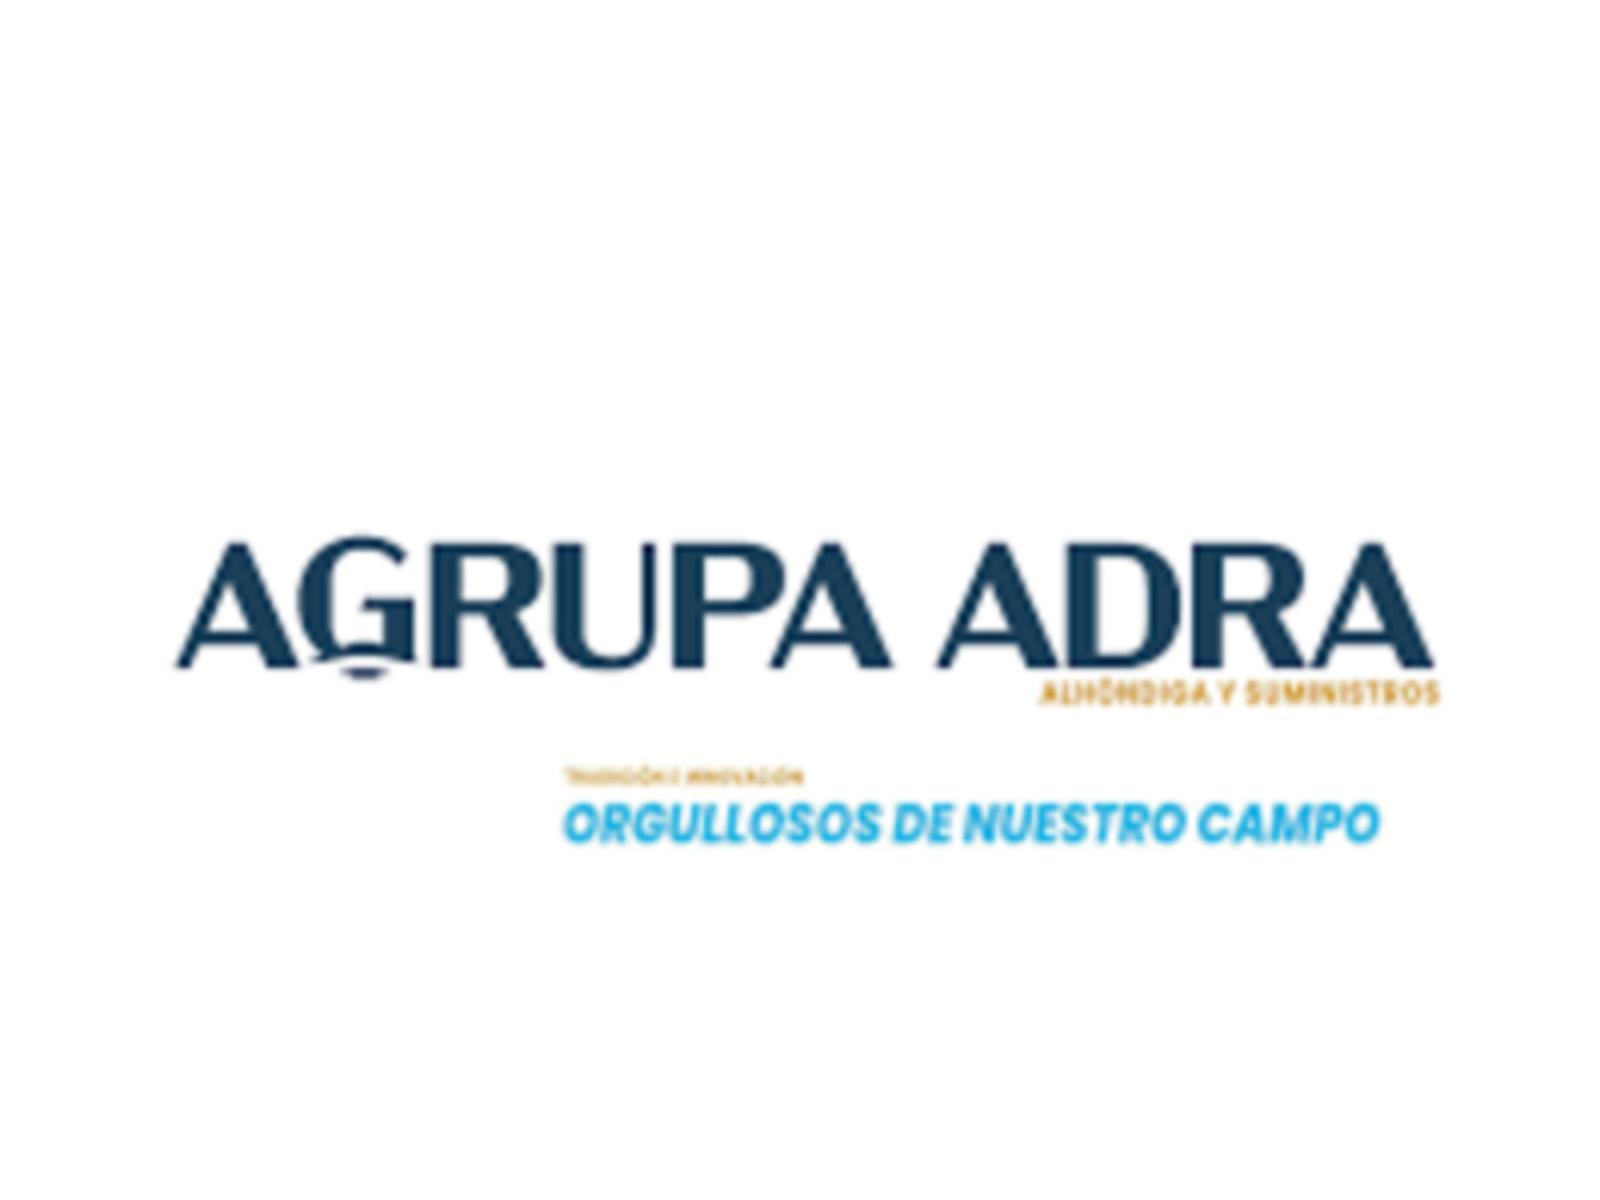 Agrupa Adra